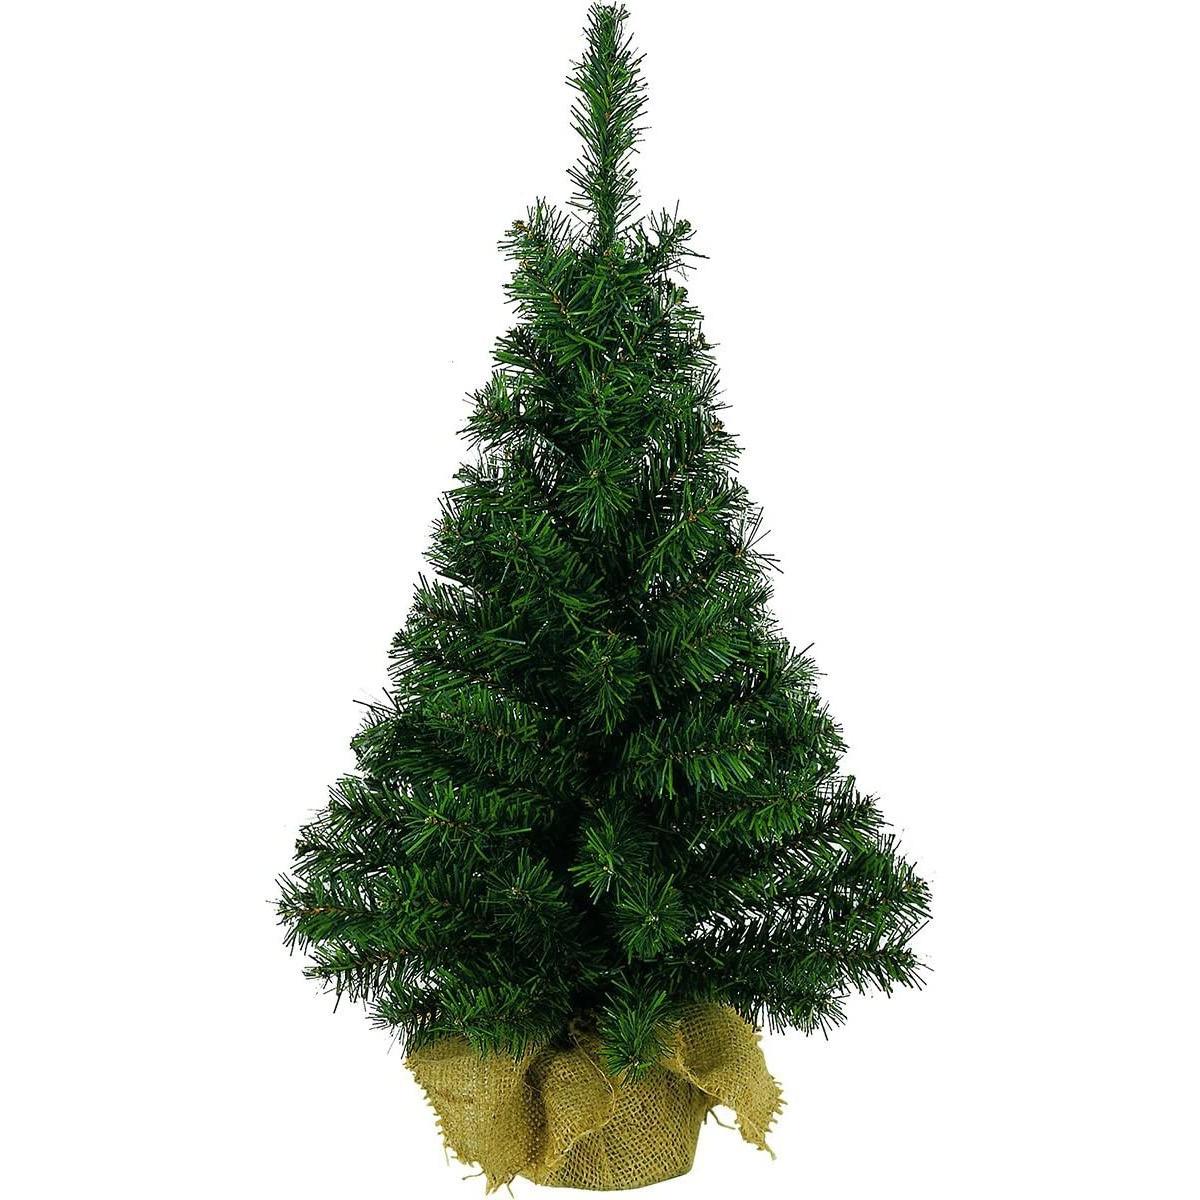 Bureau kerstboompje groen 45 cm